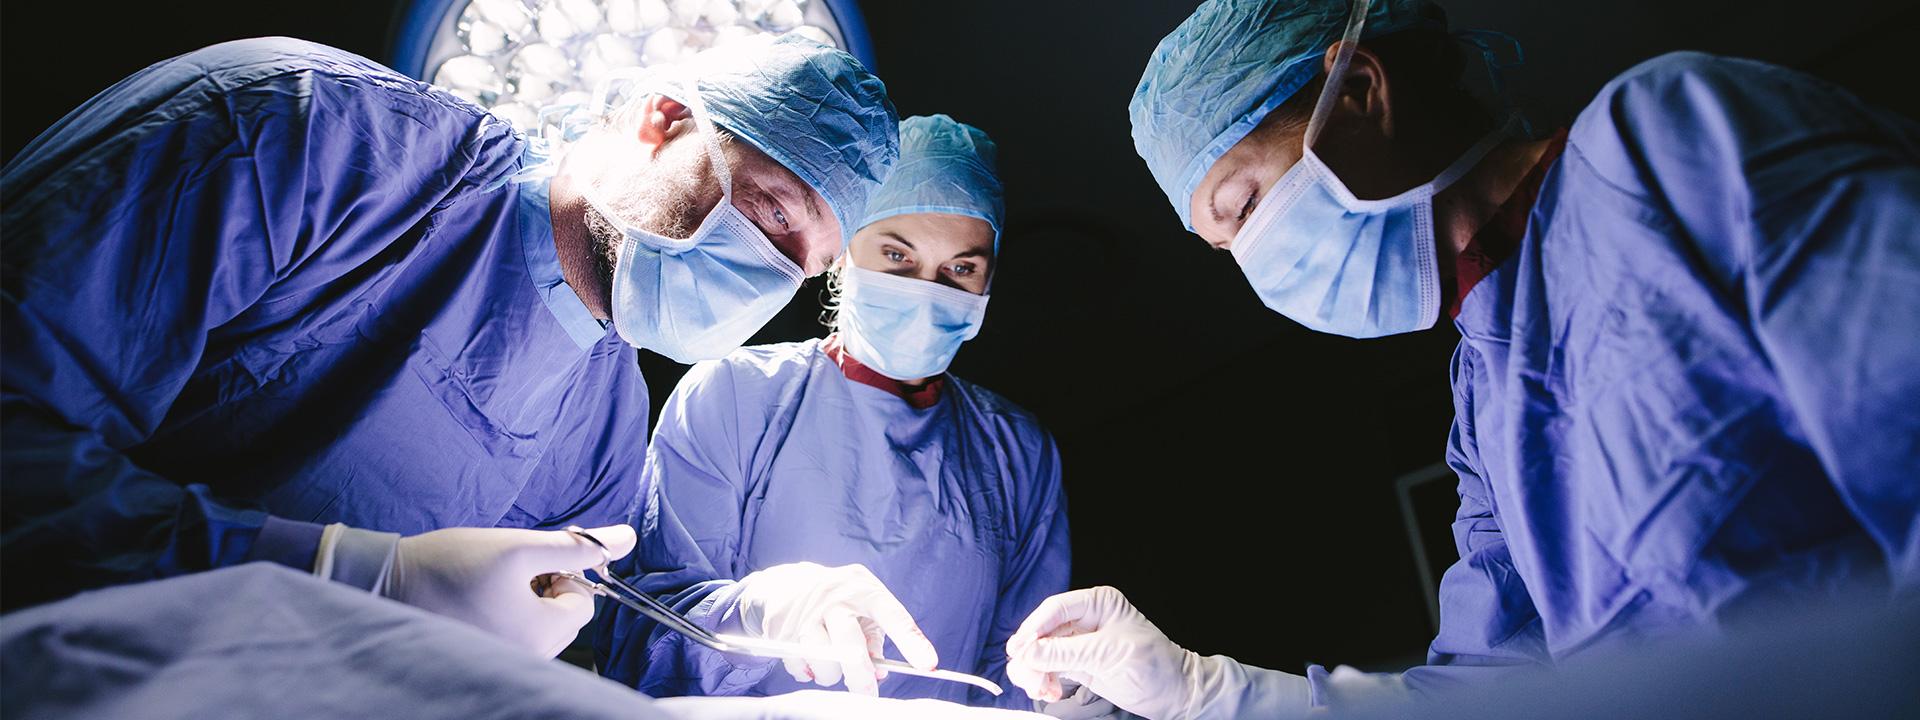 Hemithyroidectomy Banner Image